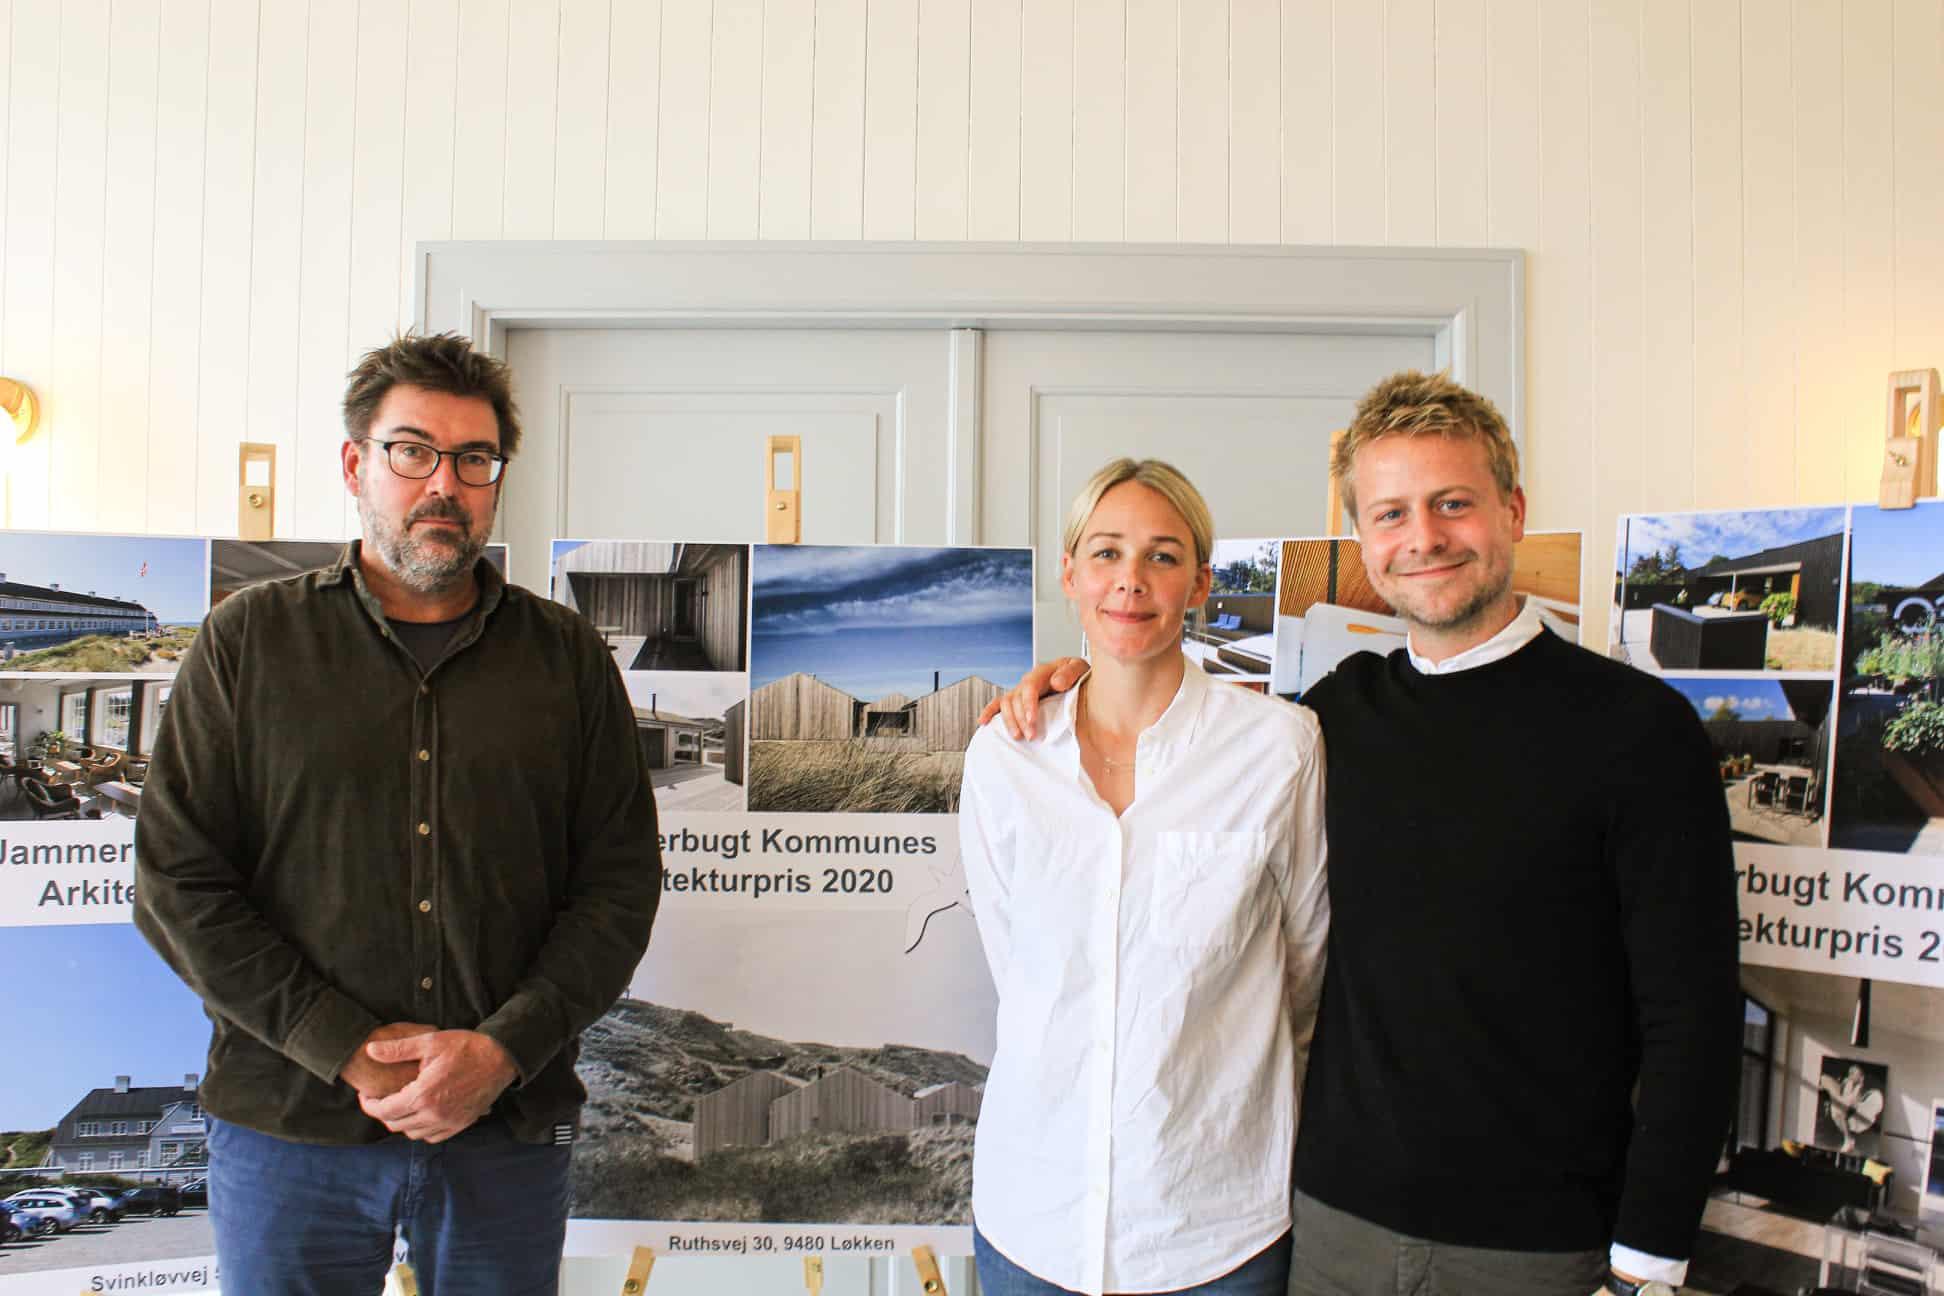 Jammerbugt kommunes Arkitekturpris 2020